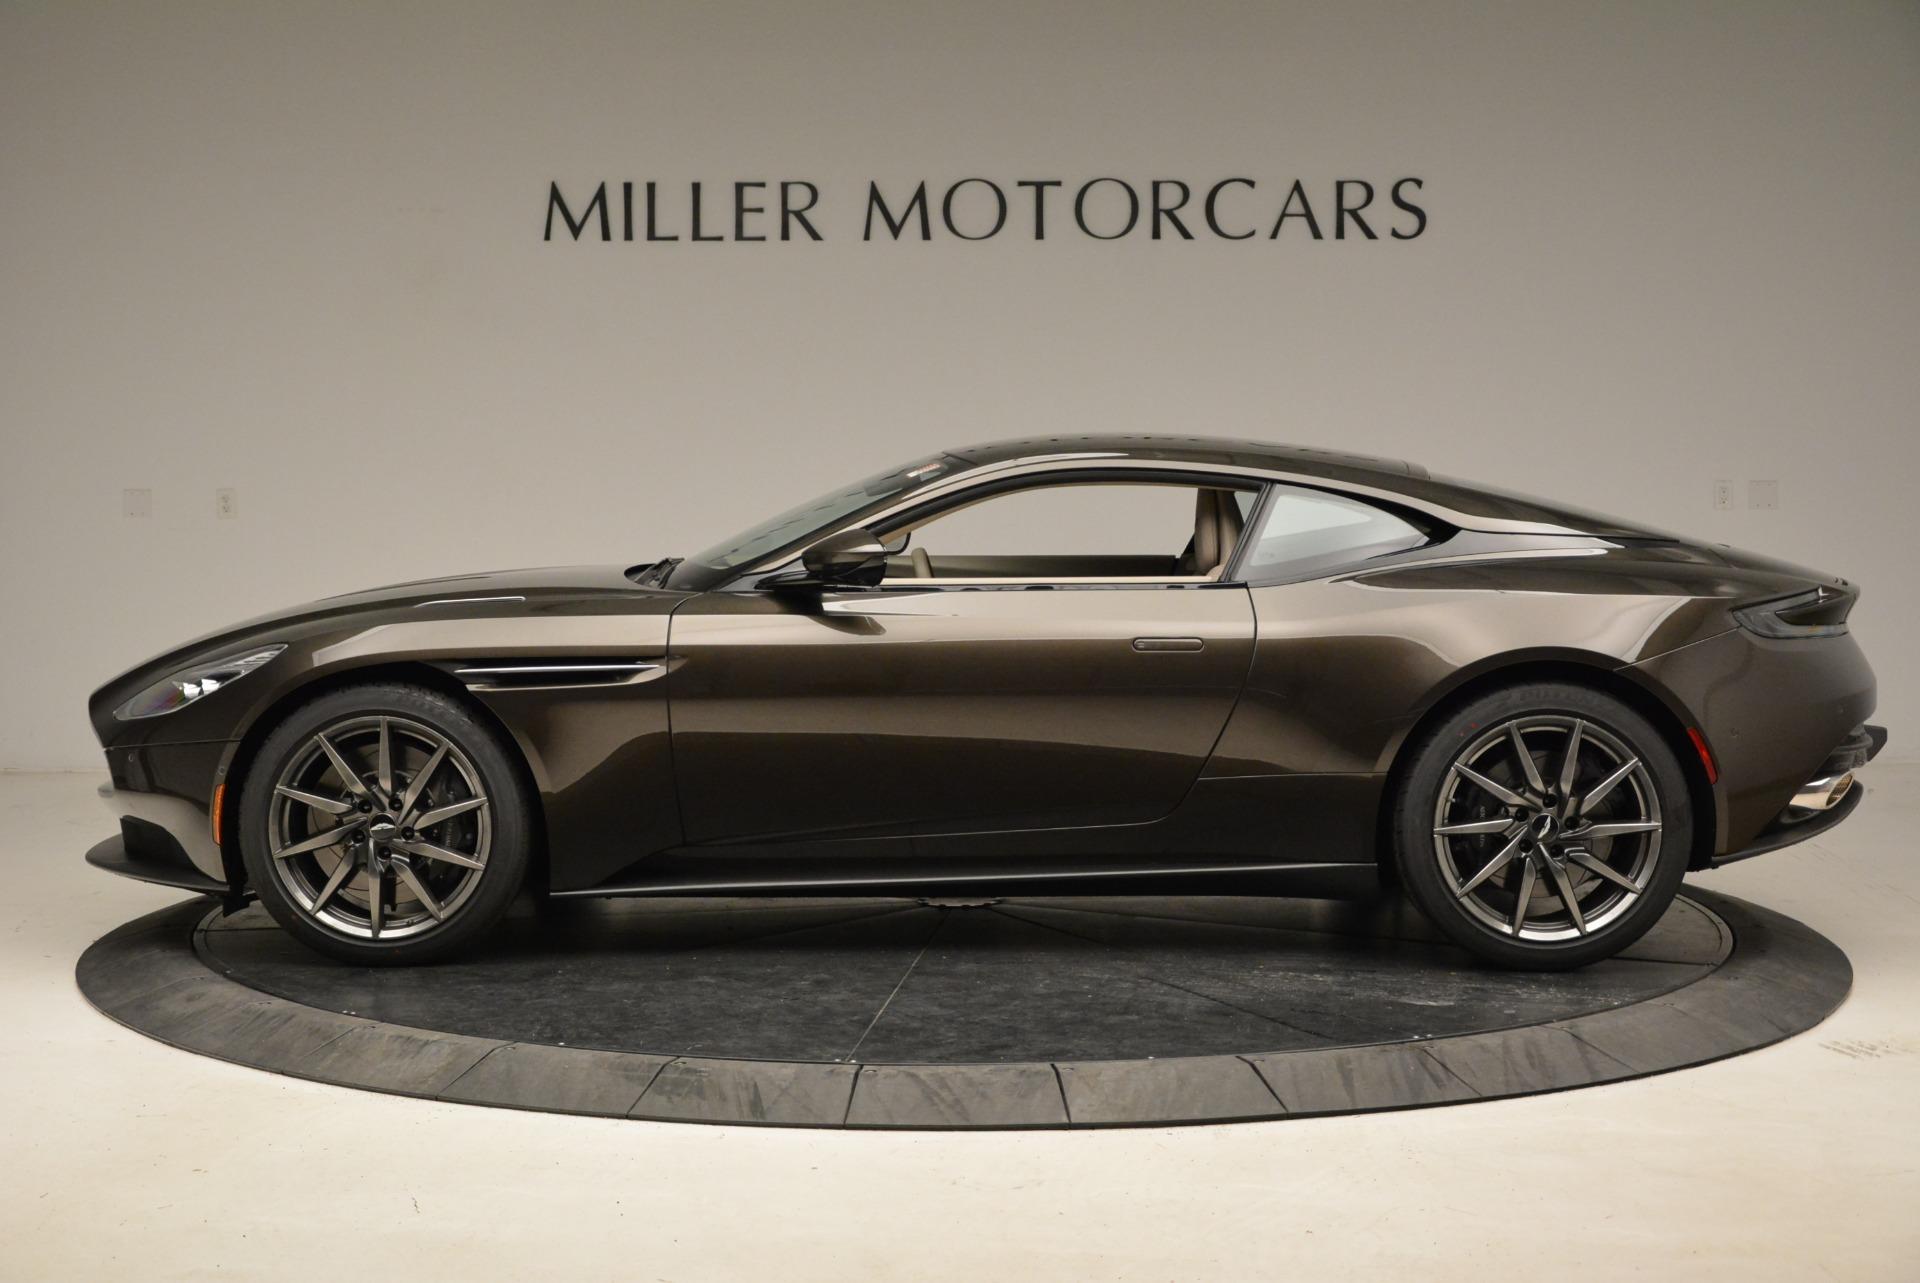 New 2018 Aston Martin DB11 V12 For Sale In Greenwich, CT 1904_p3